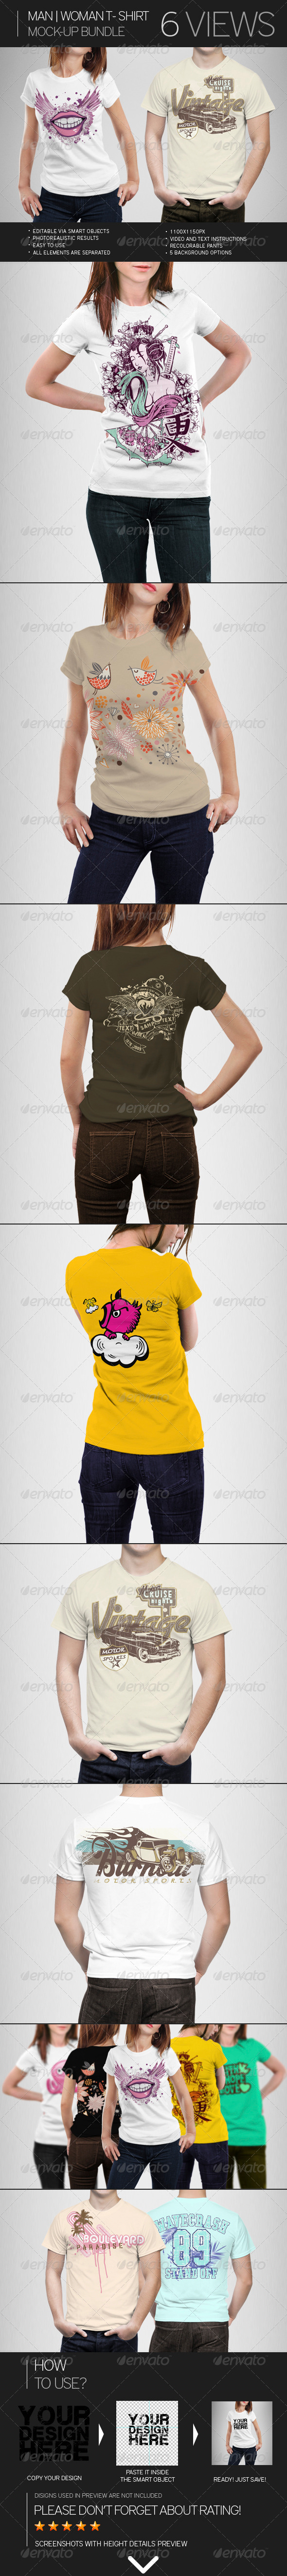 Man | Woman T-Shirt Mock-Up Bundle